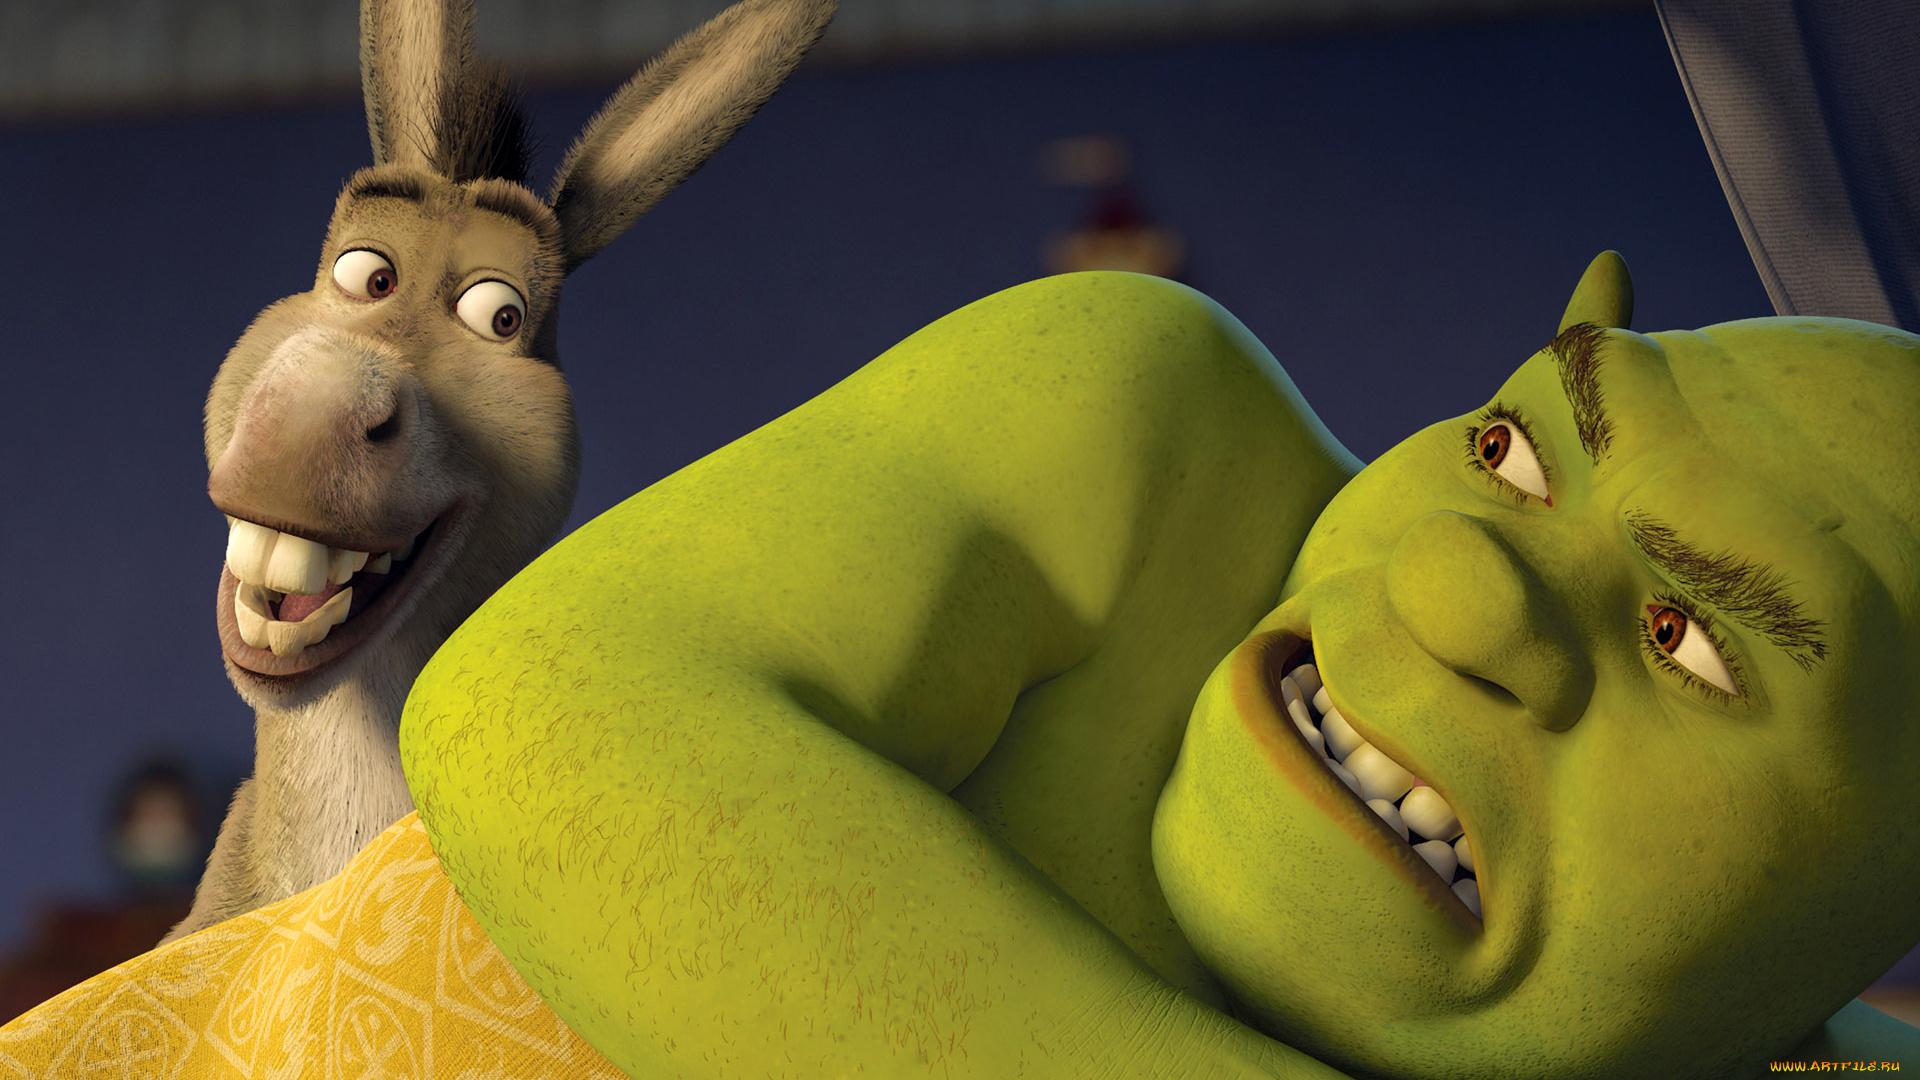 Shrek nhenta naked image